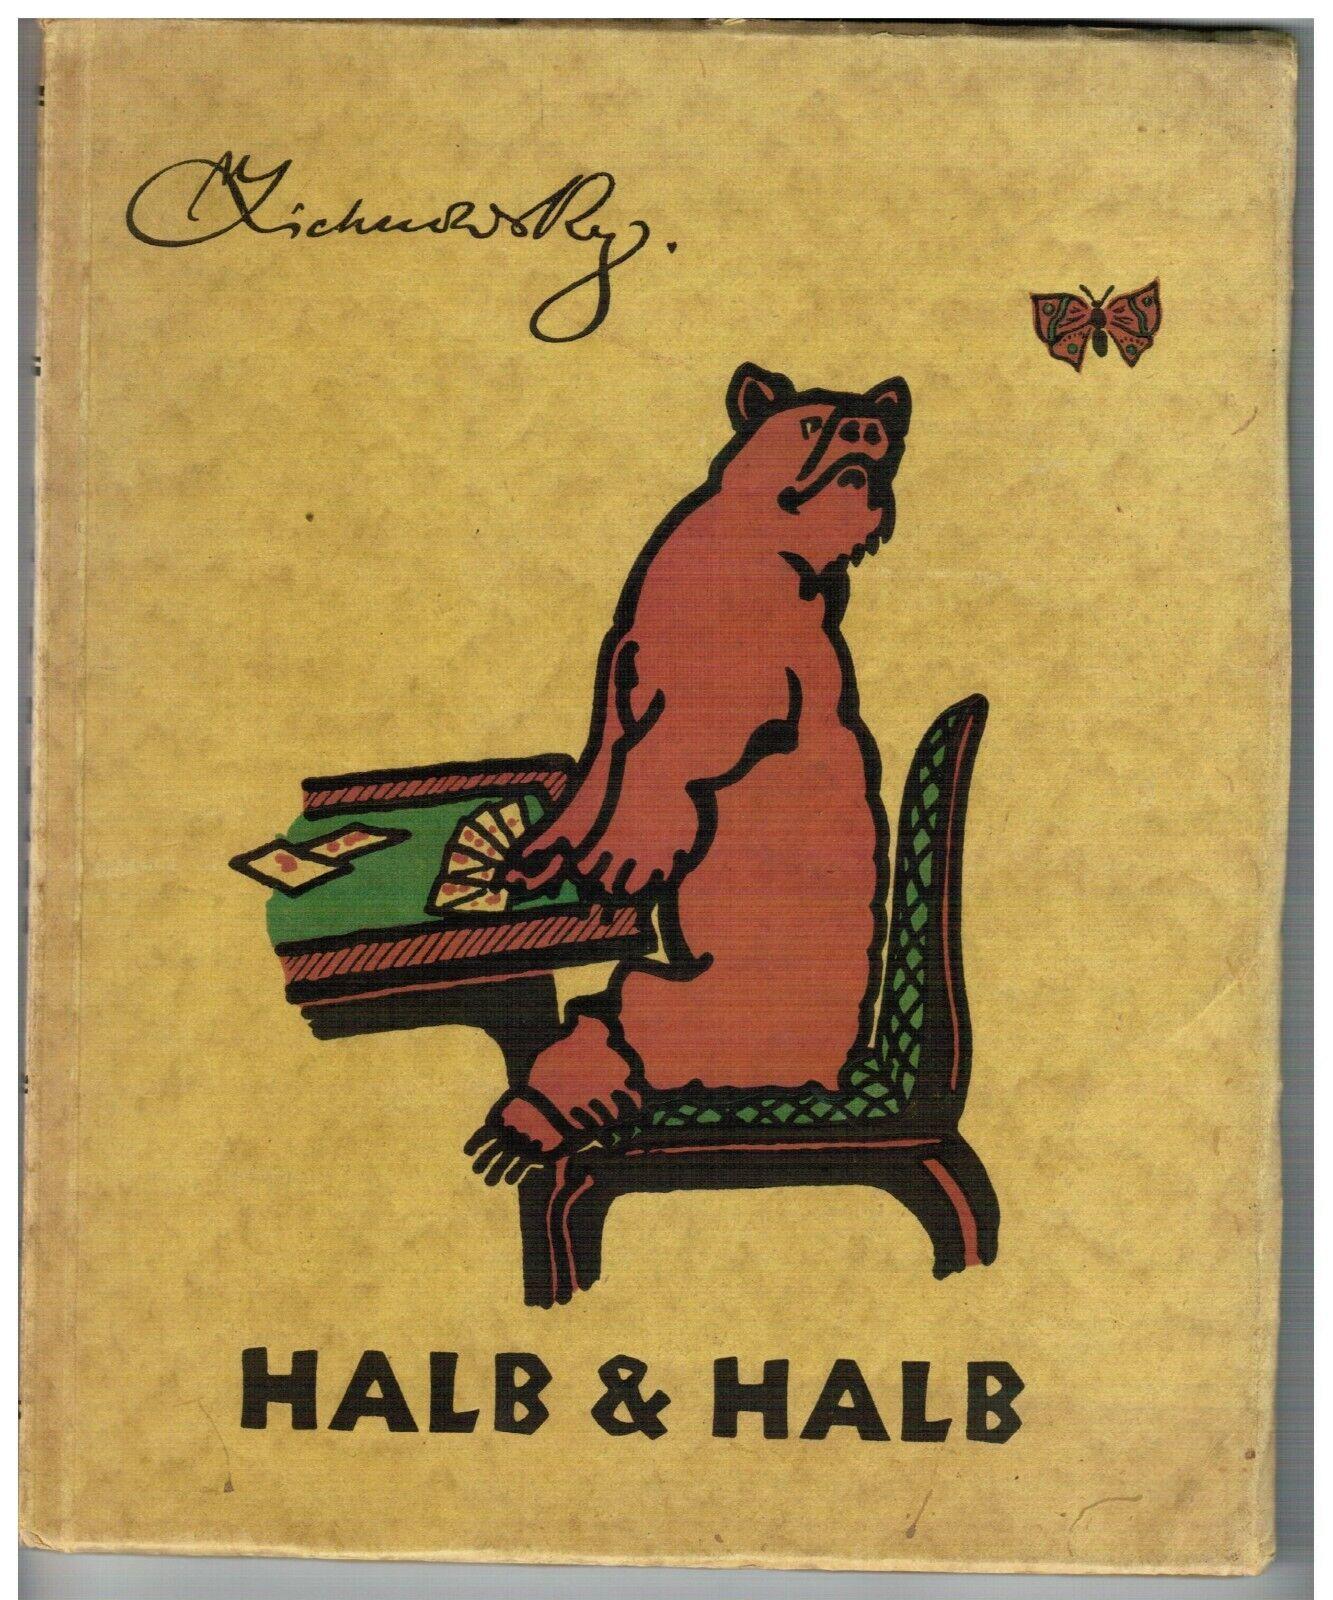 Mechthilde Lichnowsky Halb & Halb